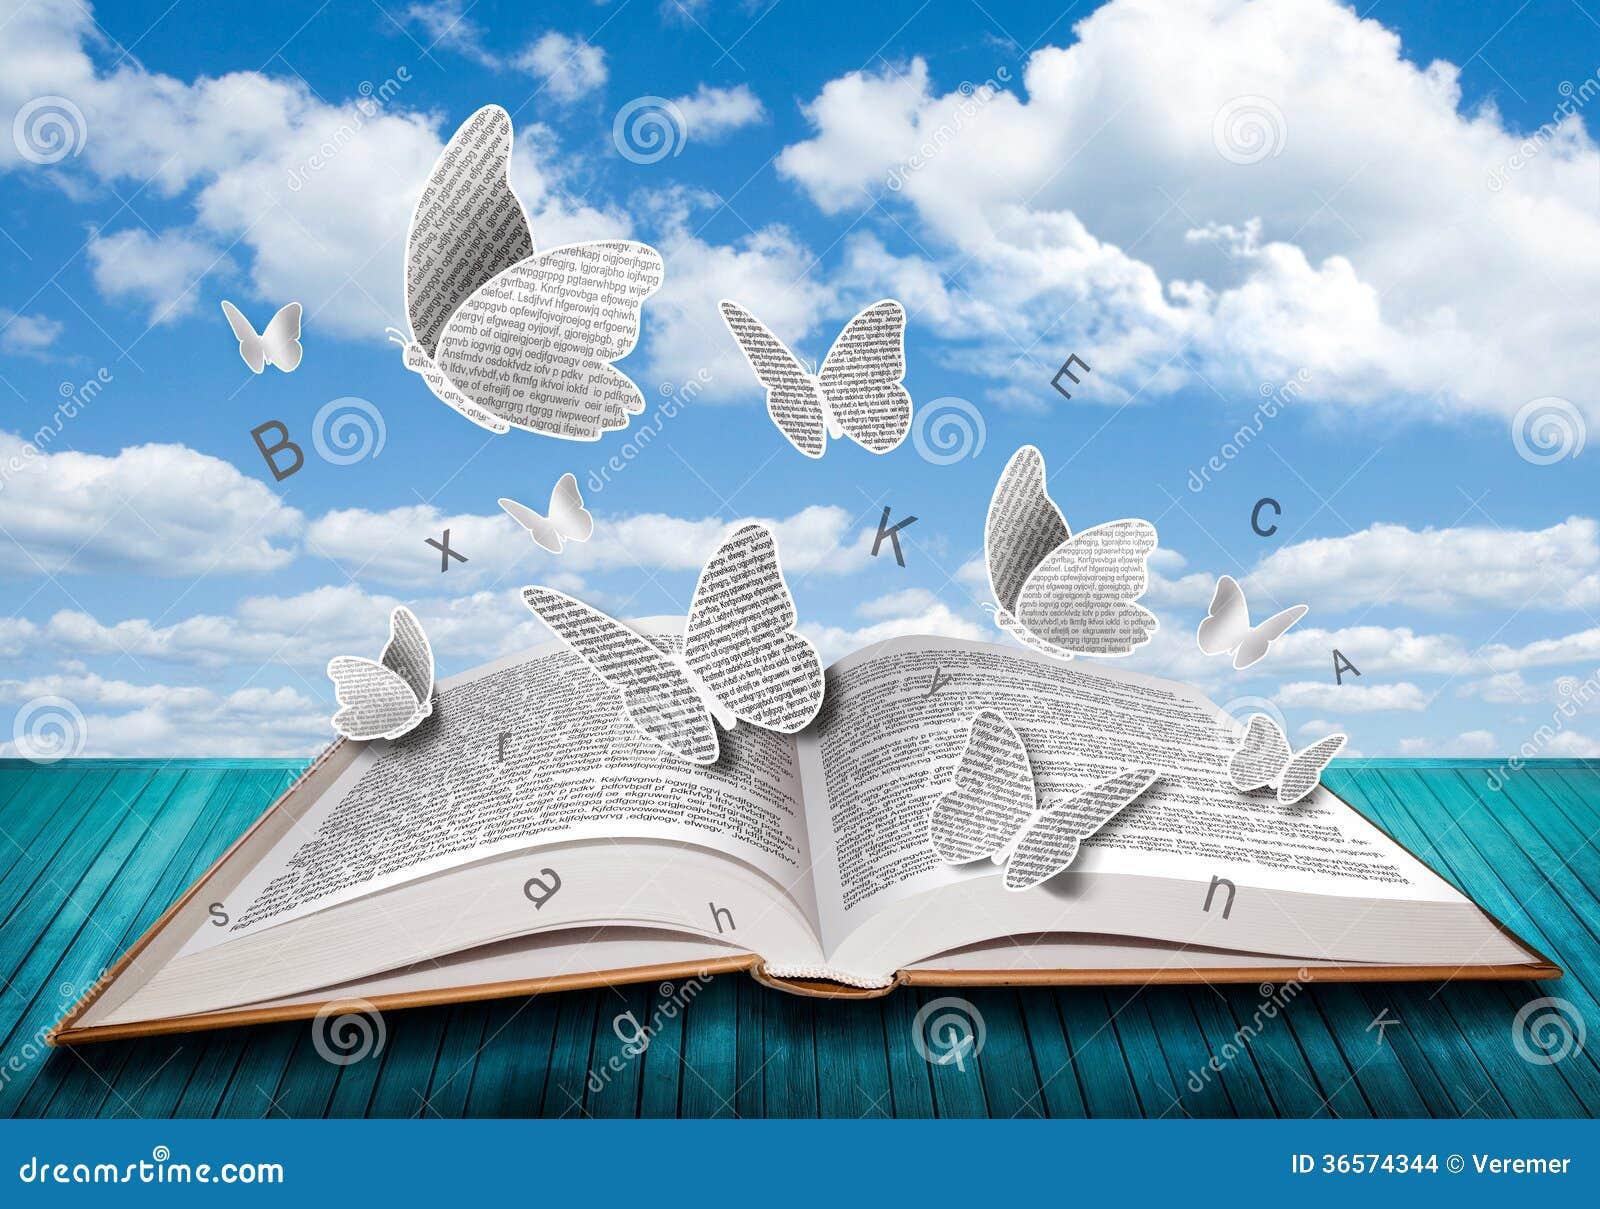 download Theorizing Language: Analysis, Normativity, Rhetoric, History